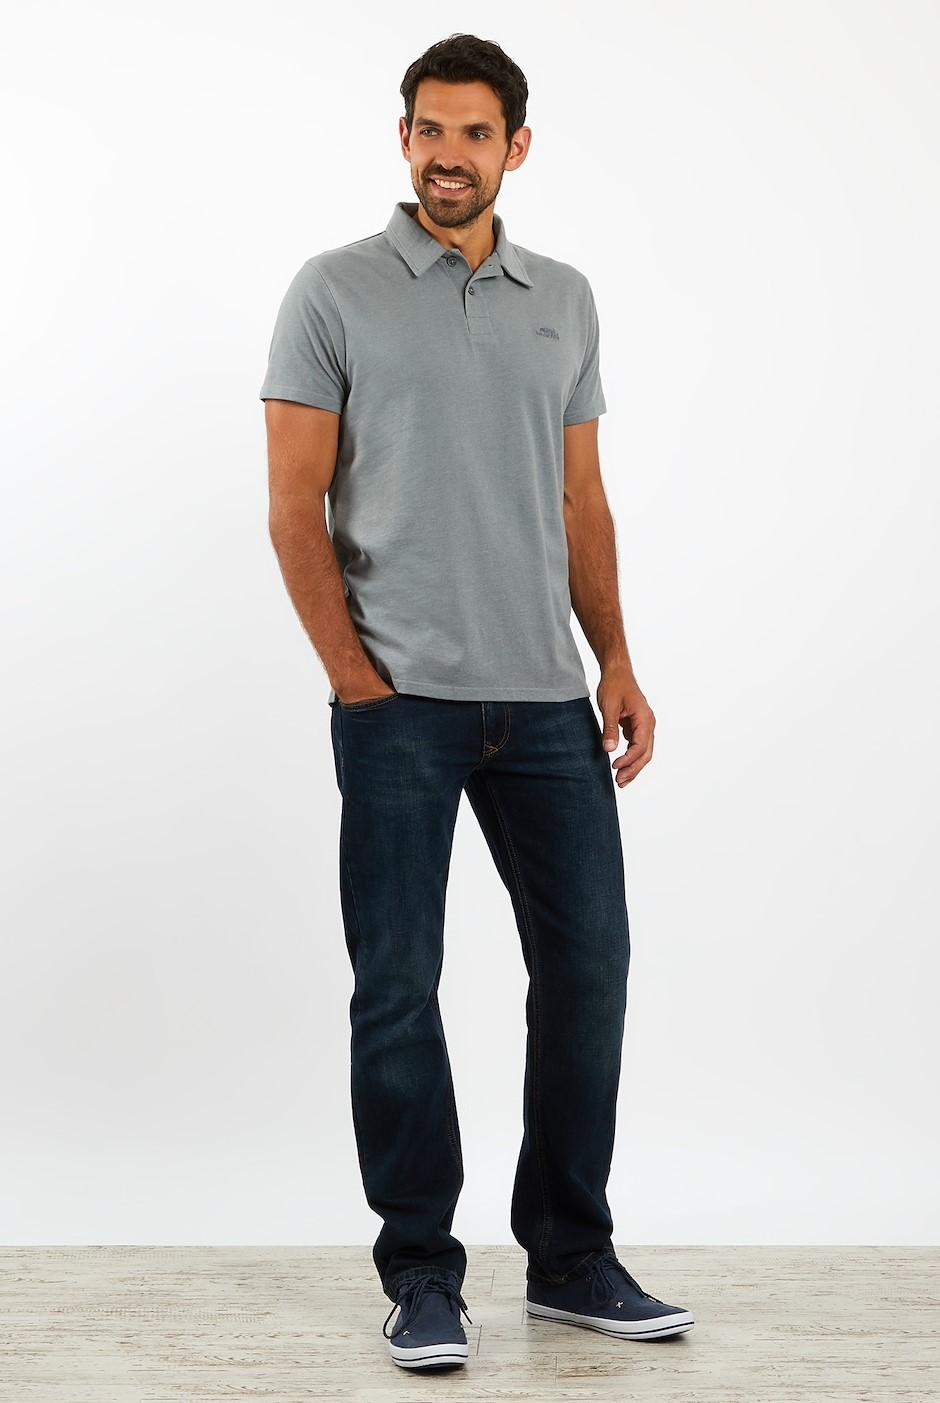 Quay Branded Polo Grey